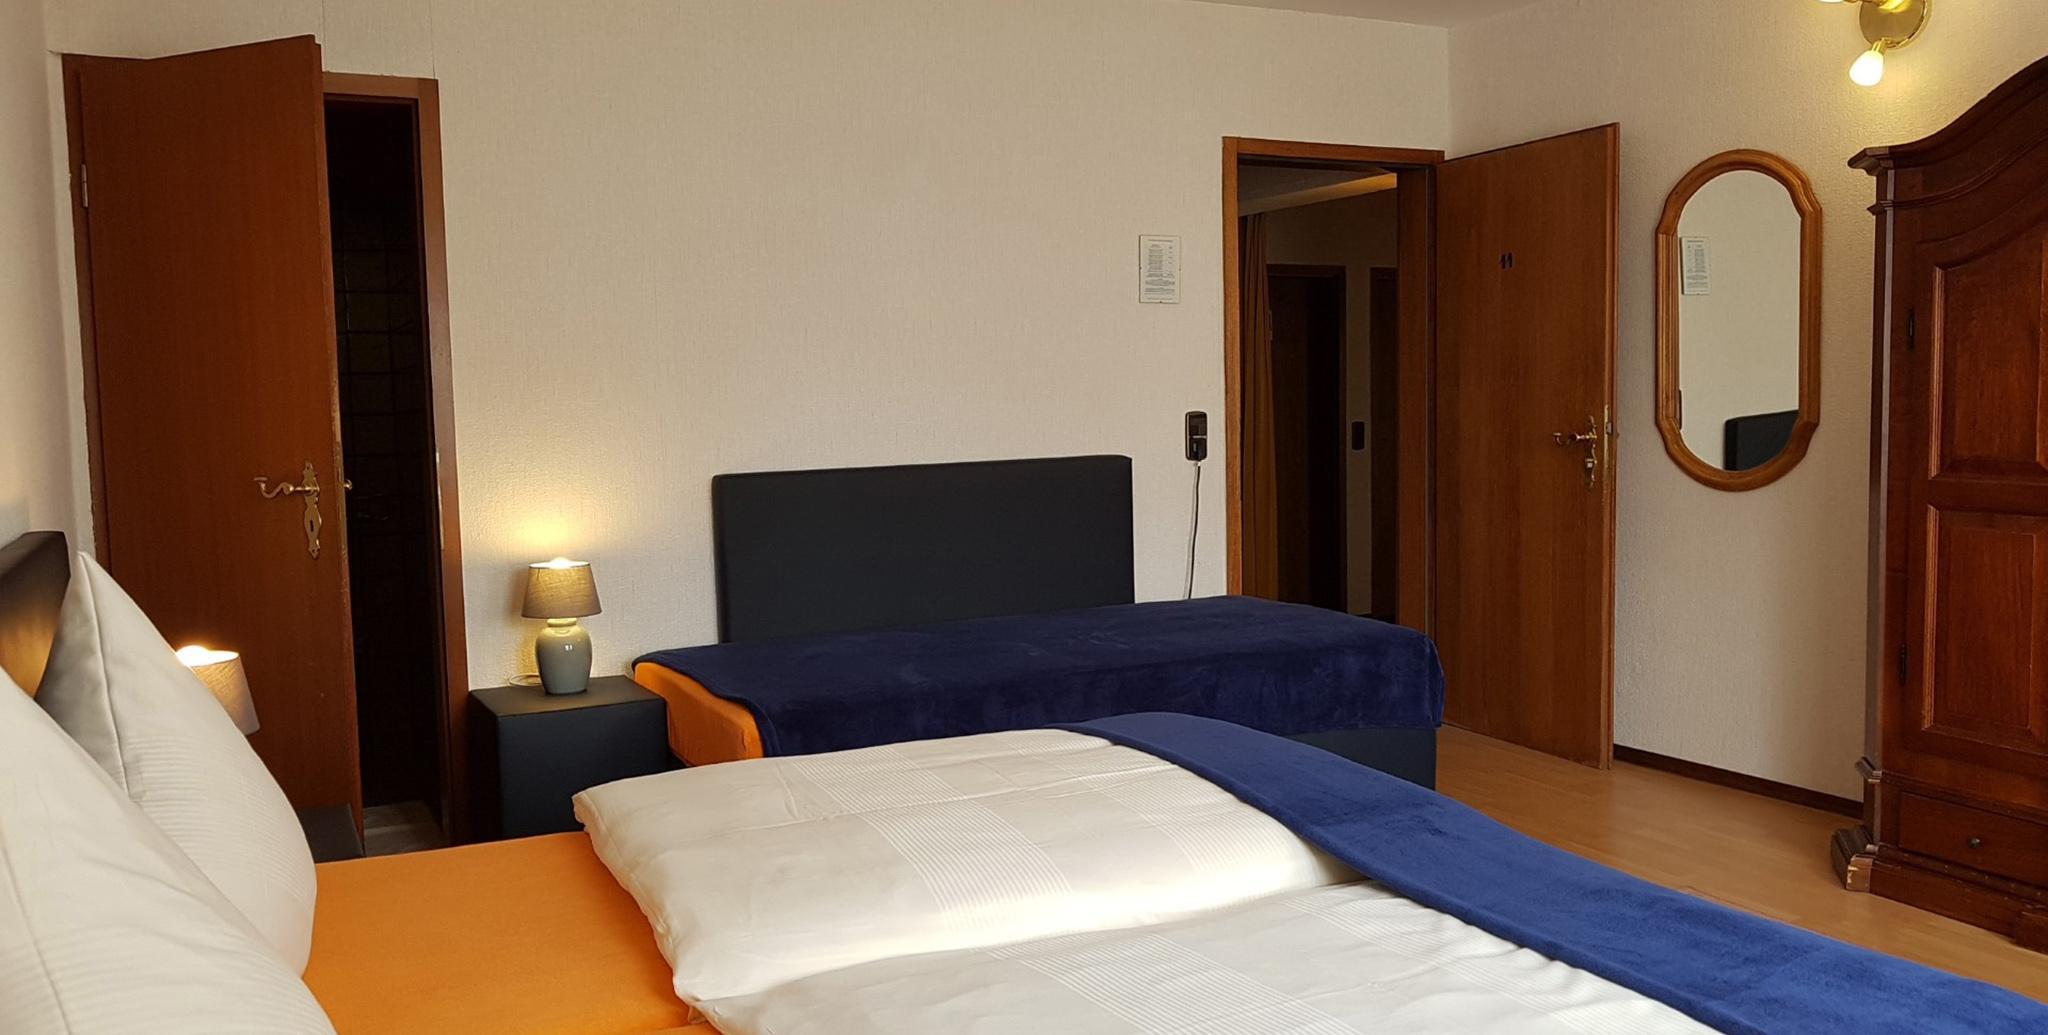 Hotel Sternberg